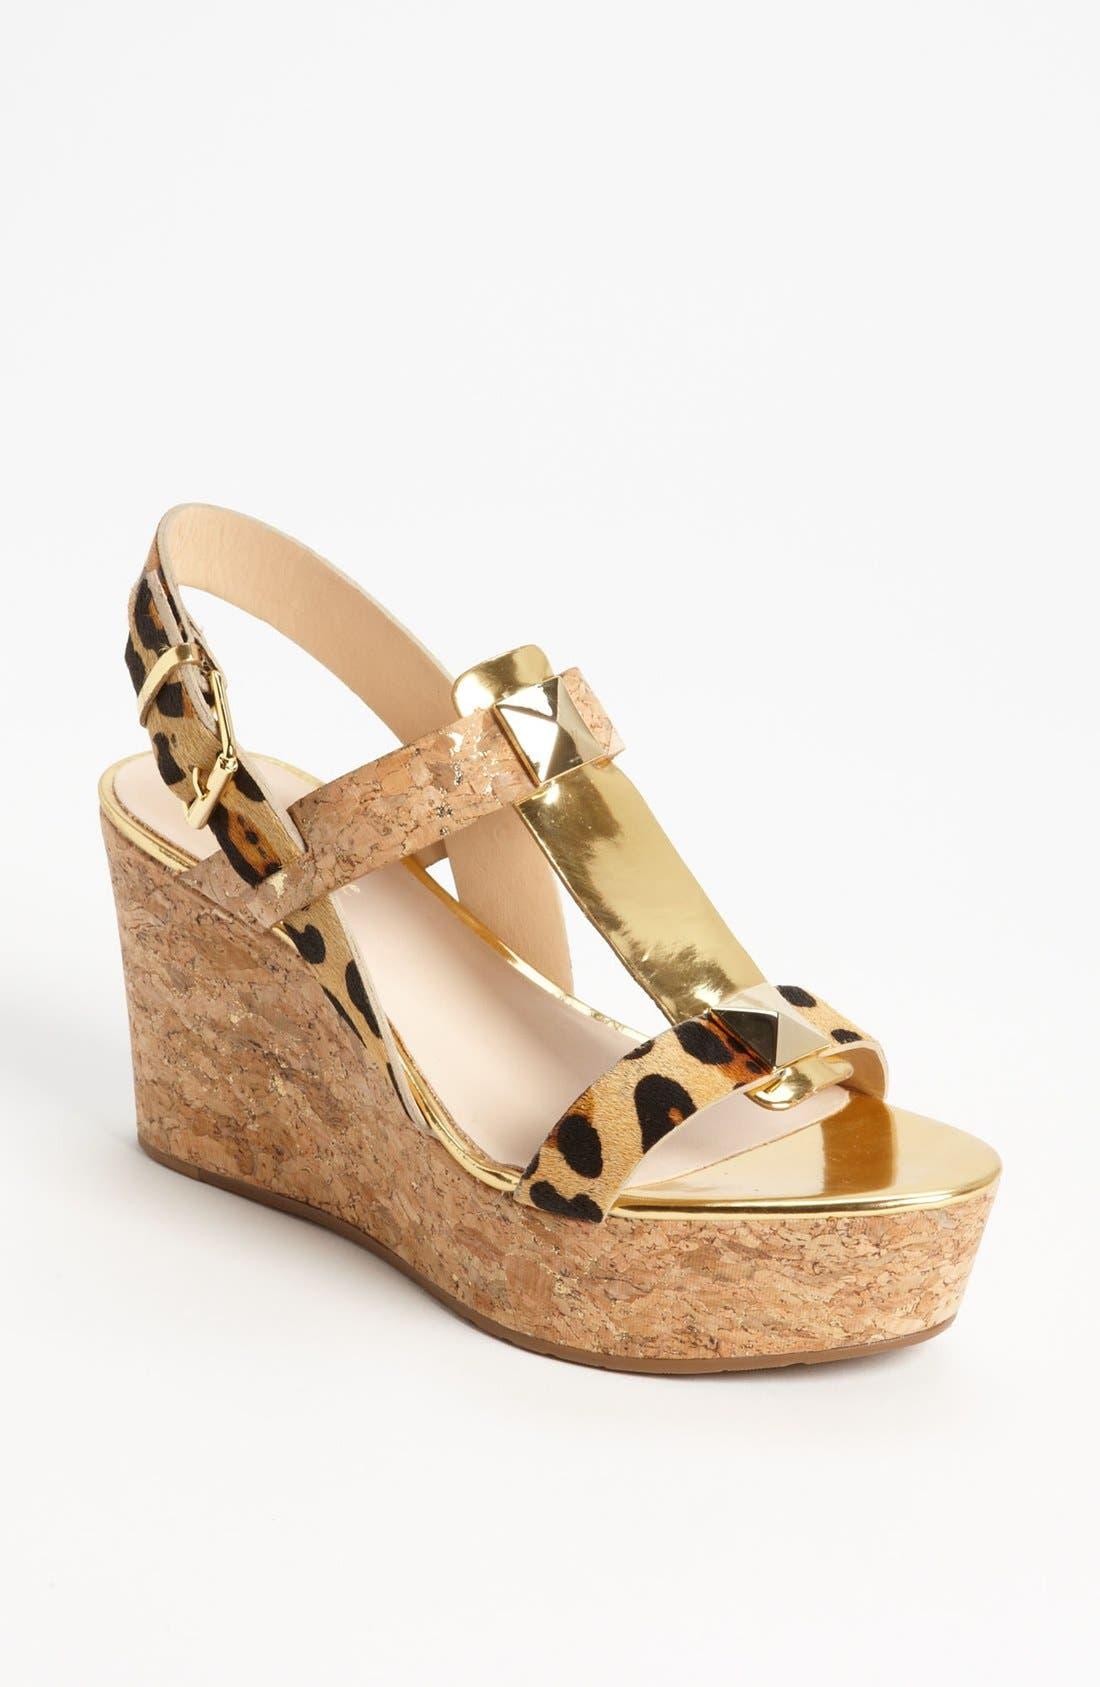 Main Image - kate spade new york 'tegan' sandal